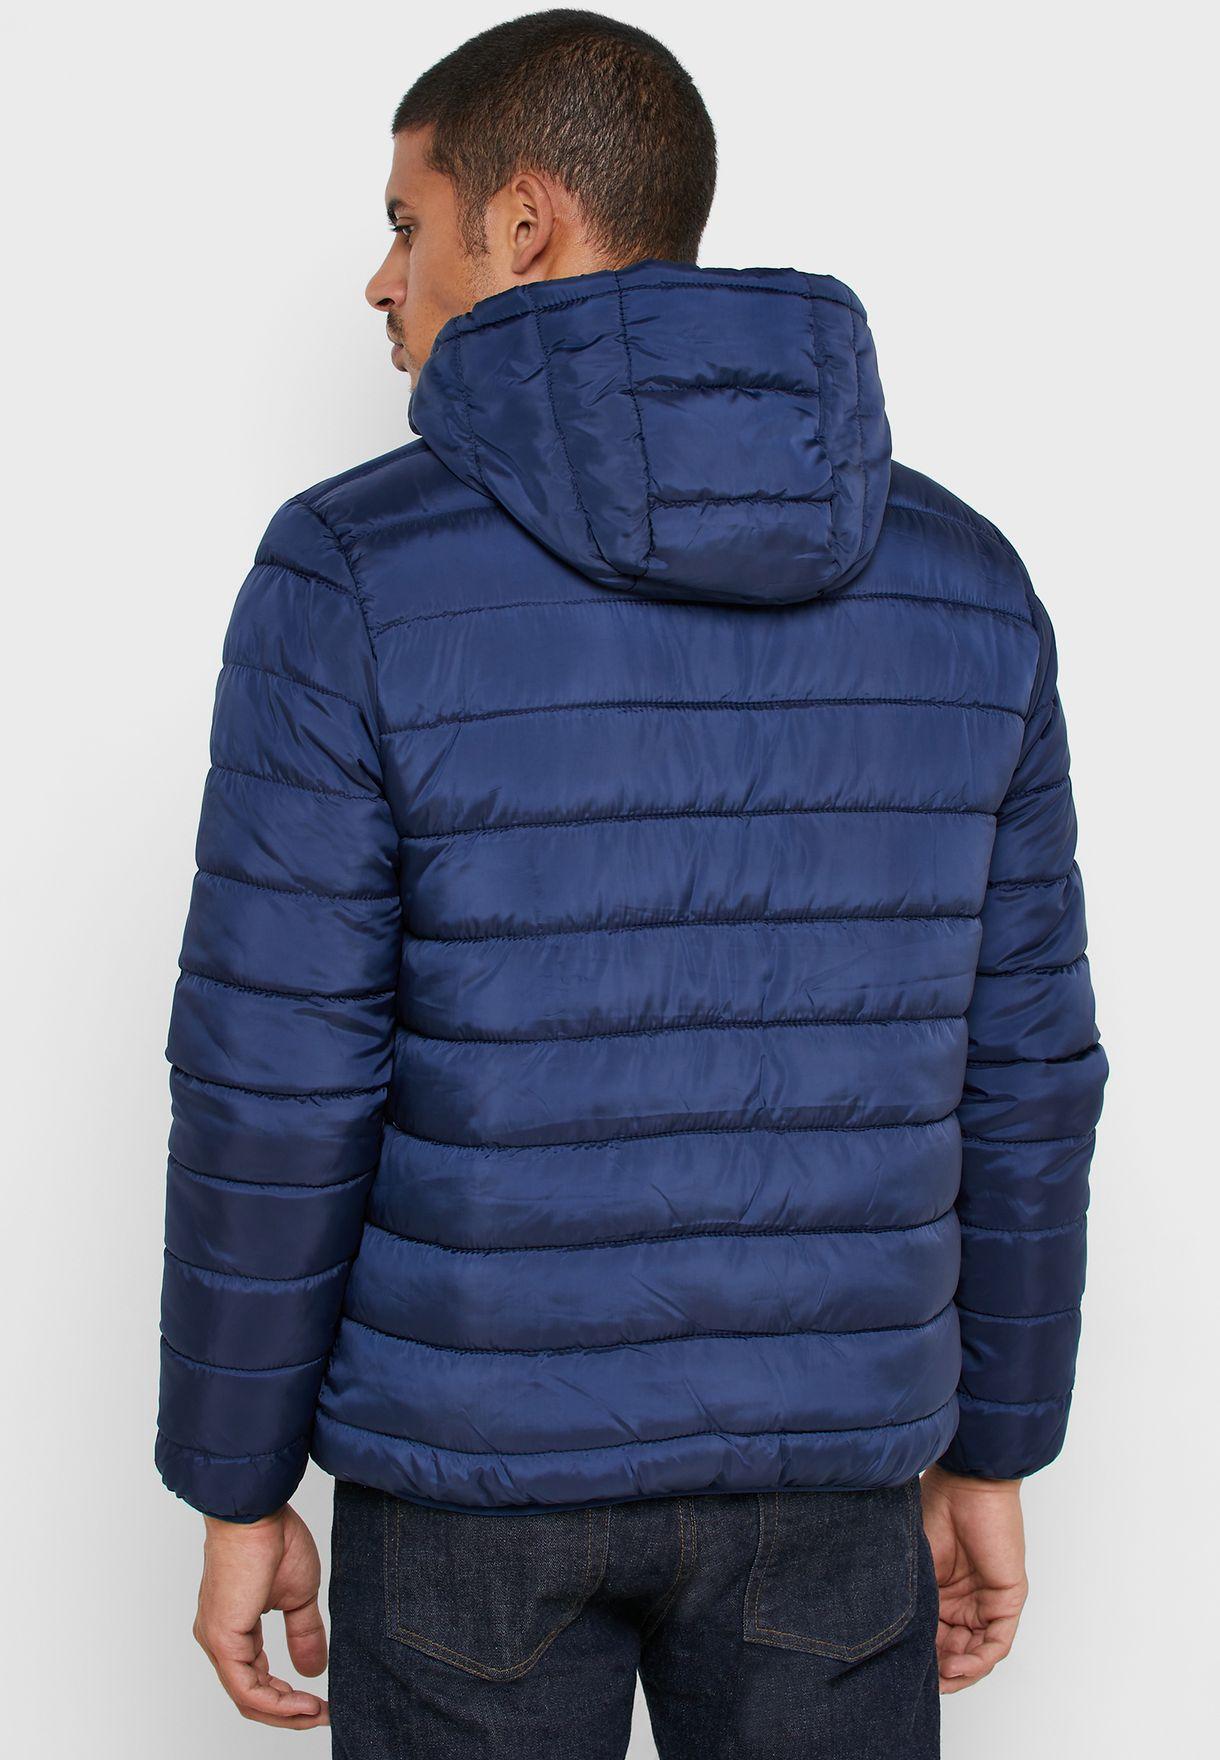 Shearling Puffer Jacket